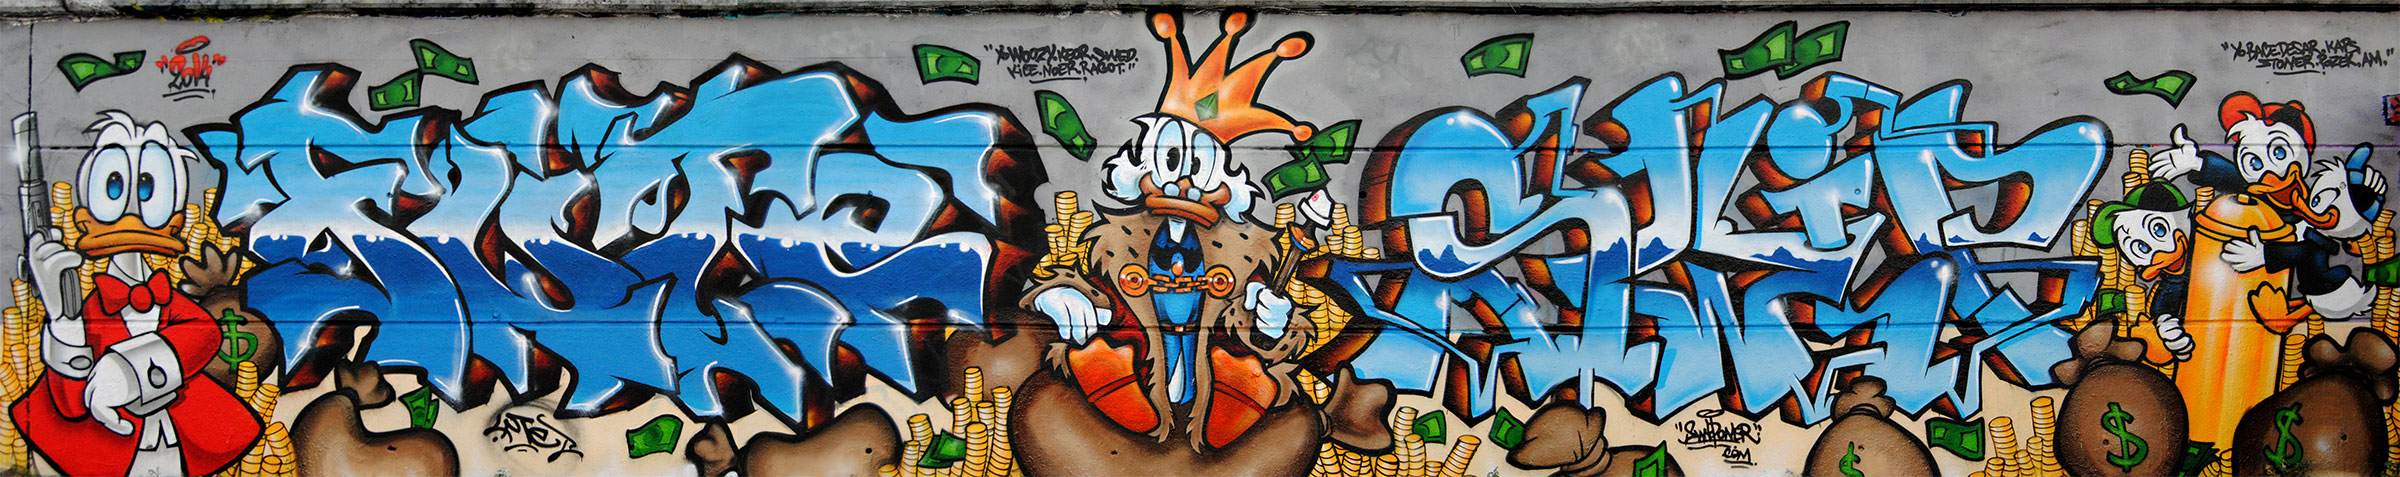 La bande a picsou graffiti fresquedecoration graffiti toulouse swip swiponer picsou donald fresque